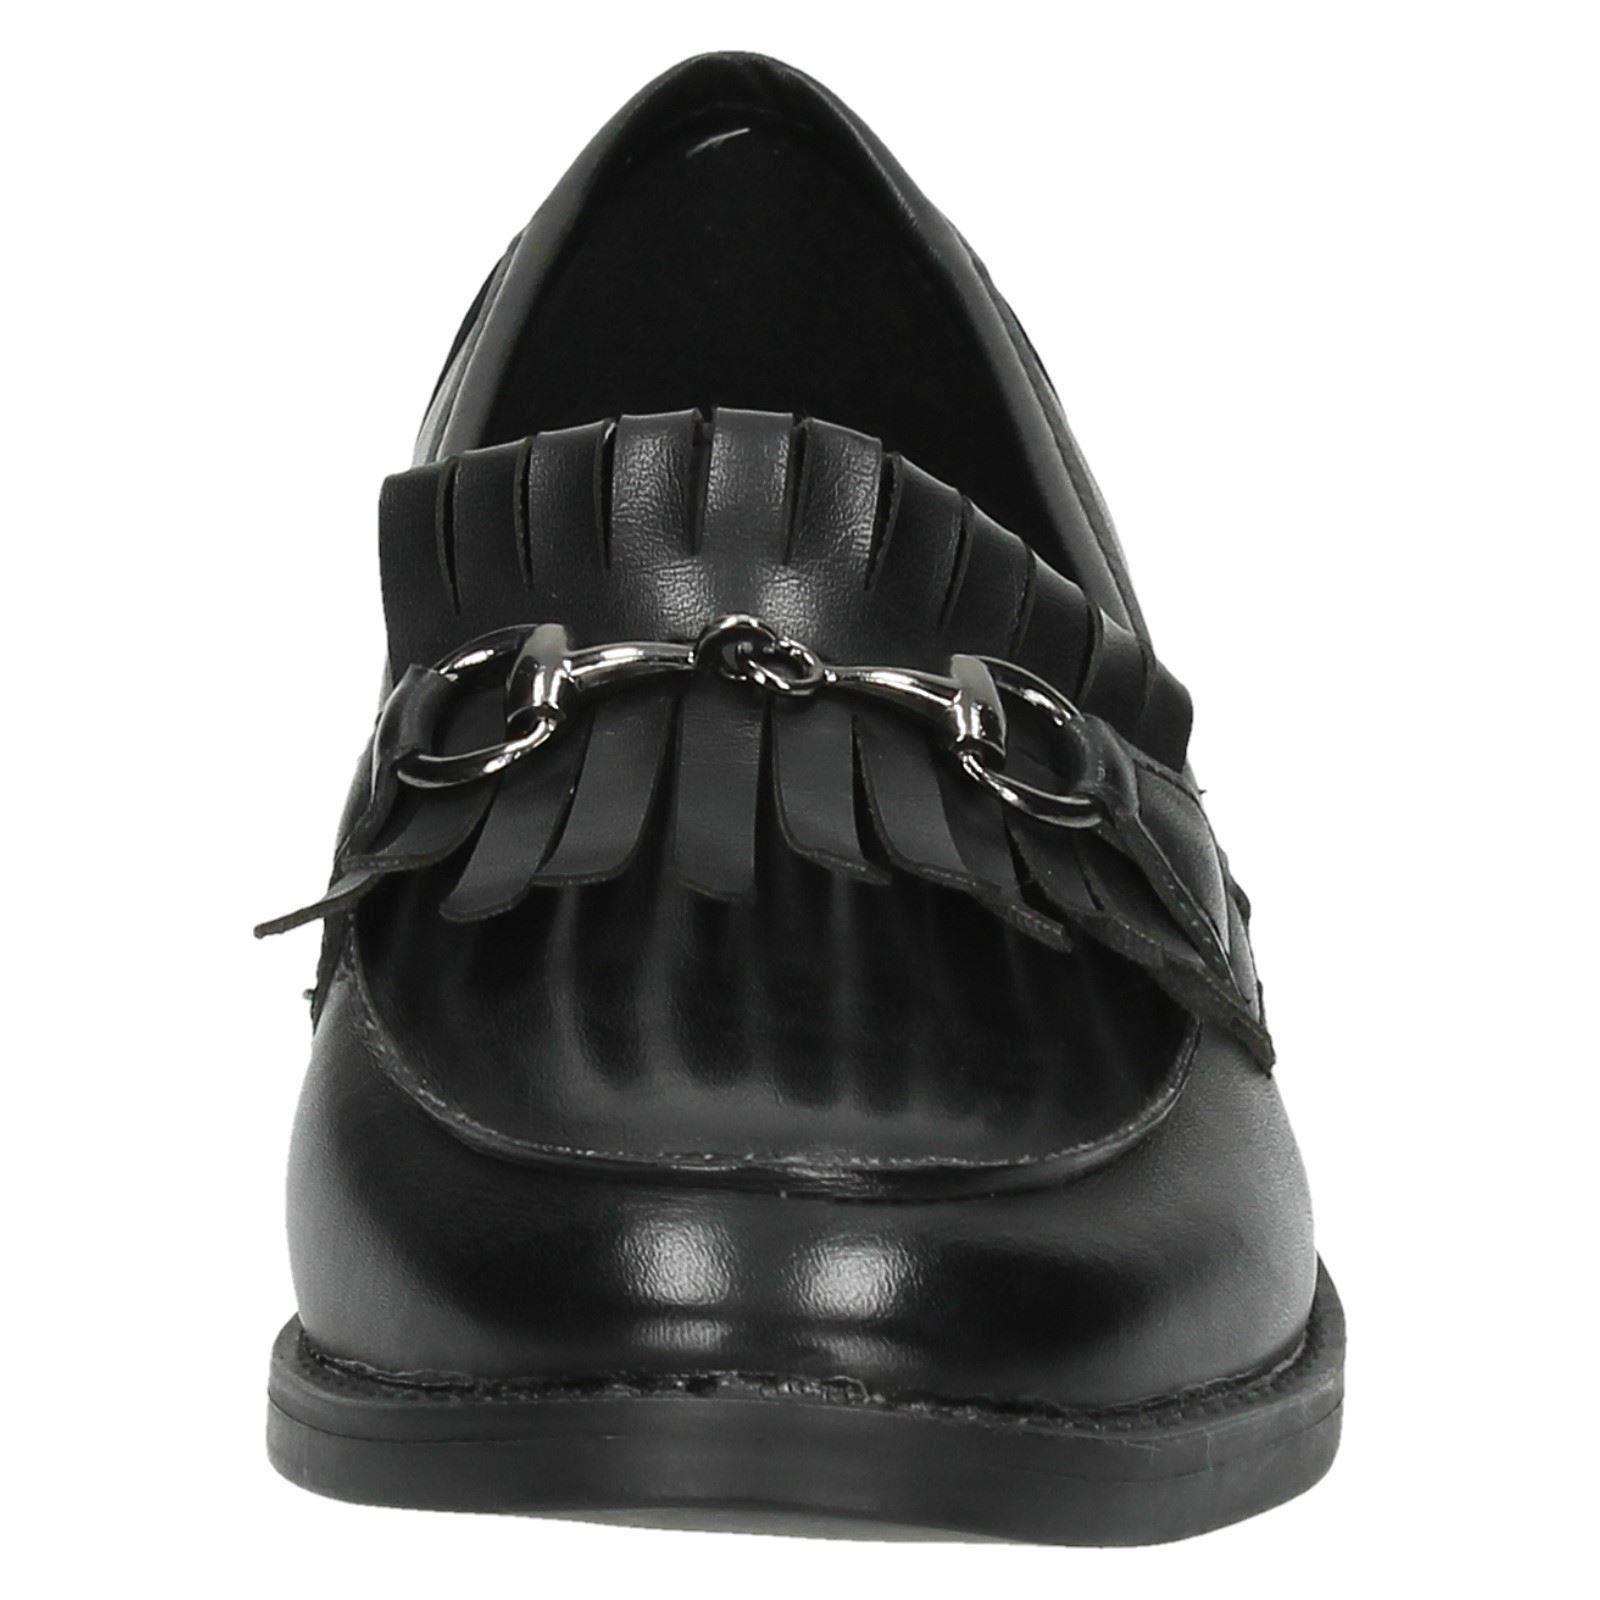 Mujer Spot On Mocasines Zapatos Estilo 'f80131'